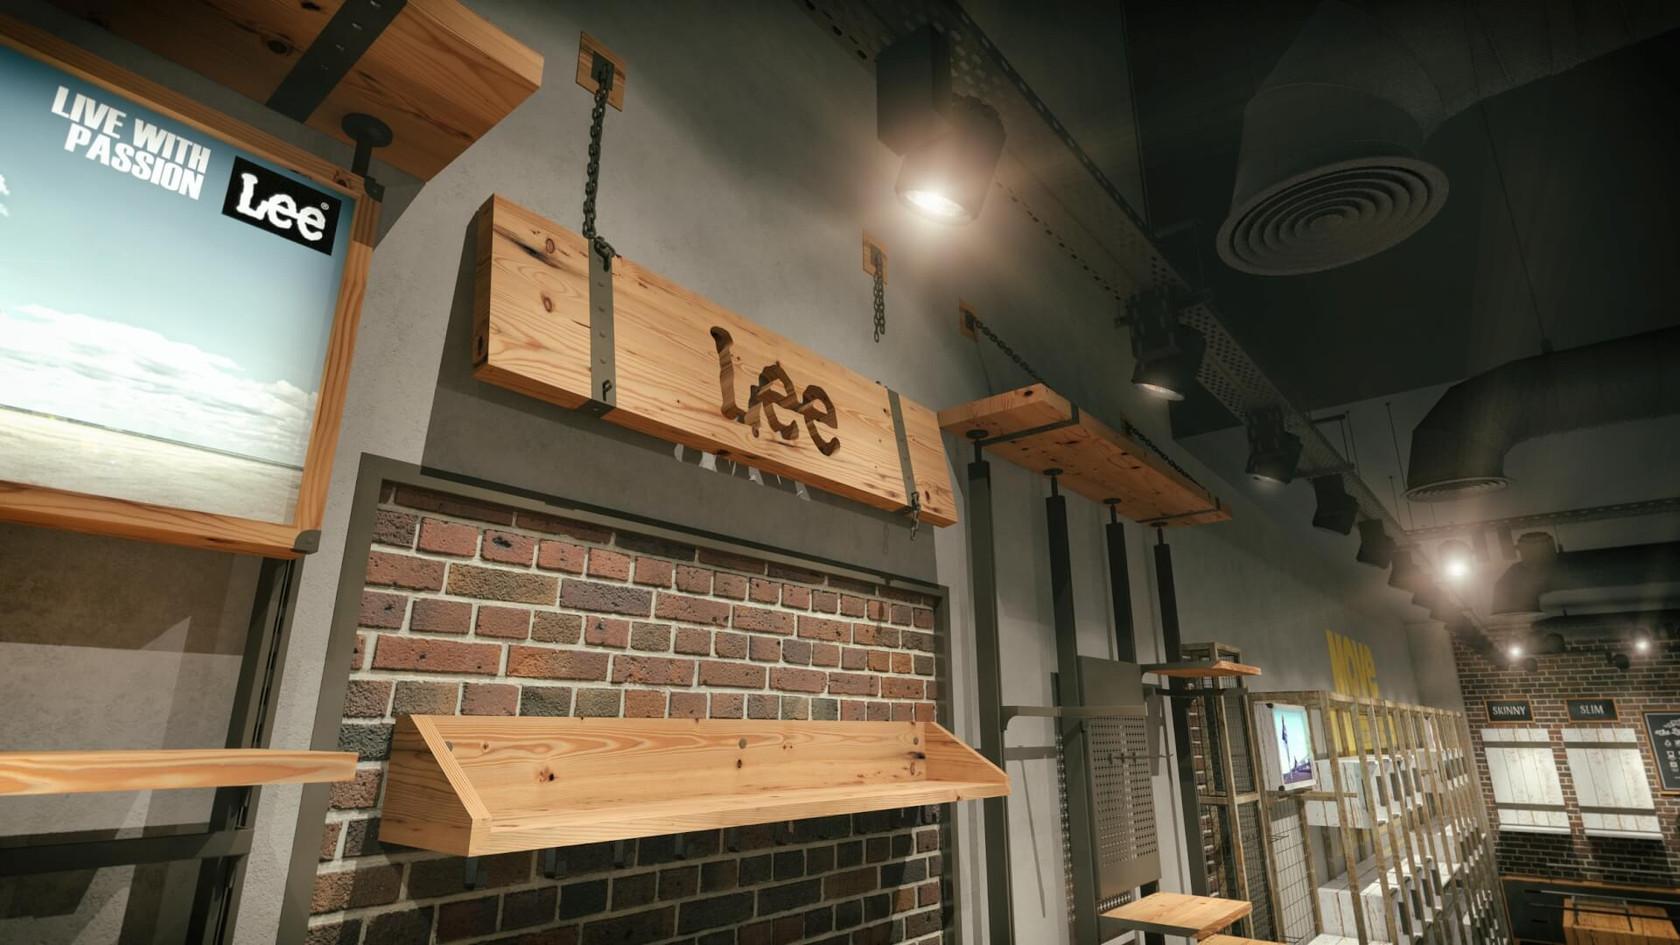 Lee Wrangler - Denim Store Shop Design